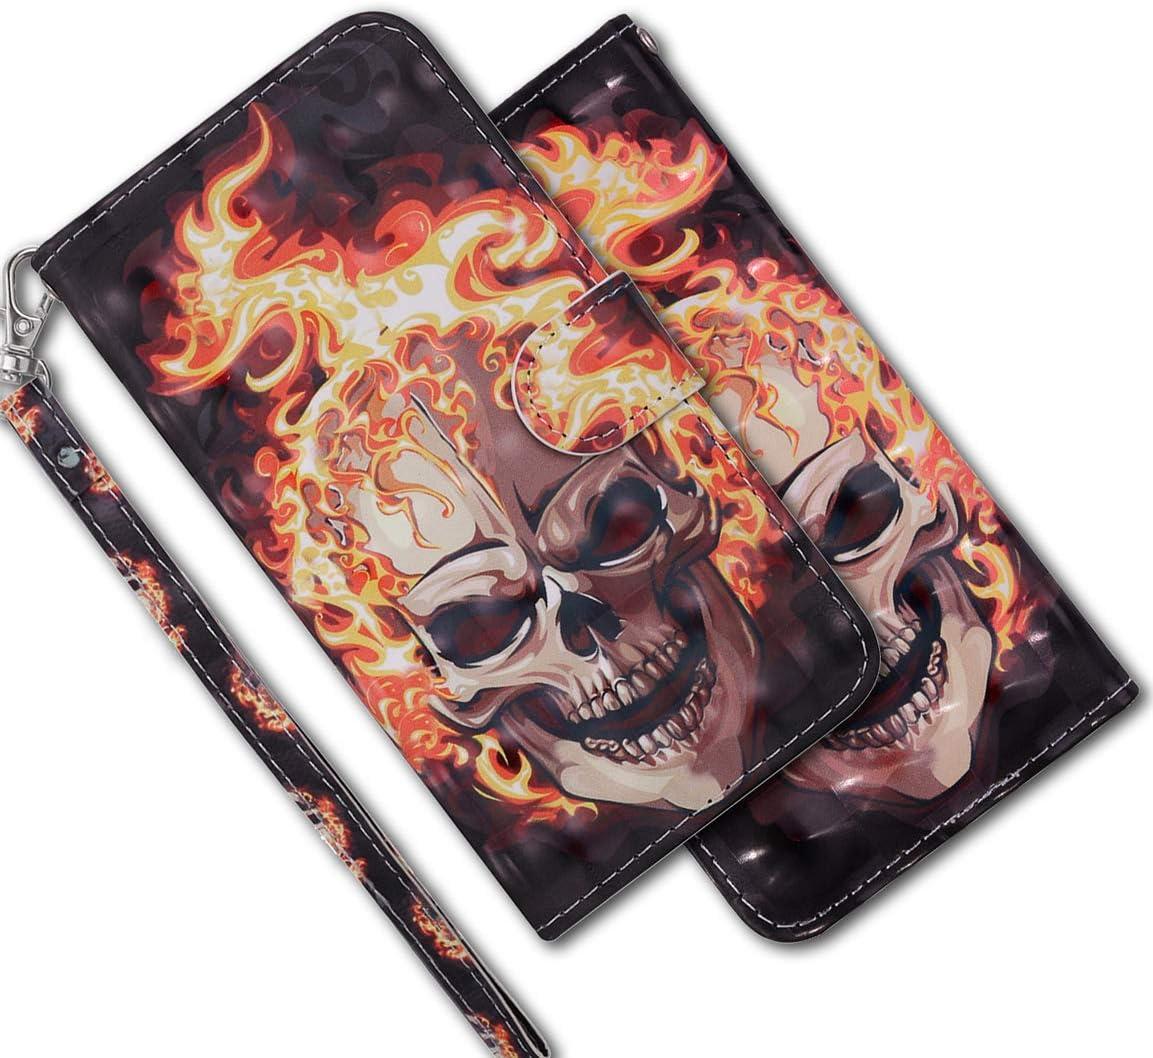 MRSTER Funda para Xiaomi Redmi 5 Plus, 3D Brillos Carcasa Libro Flip Case Antigolpes Cartera PU Cuero Funda con Soporte para Xiaomi Redmi 5 Plus. RX 3D Flame Skull